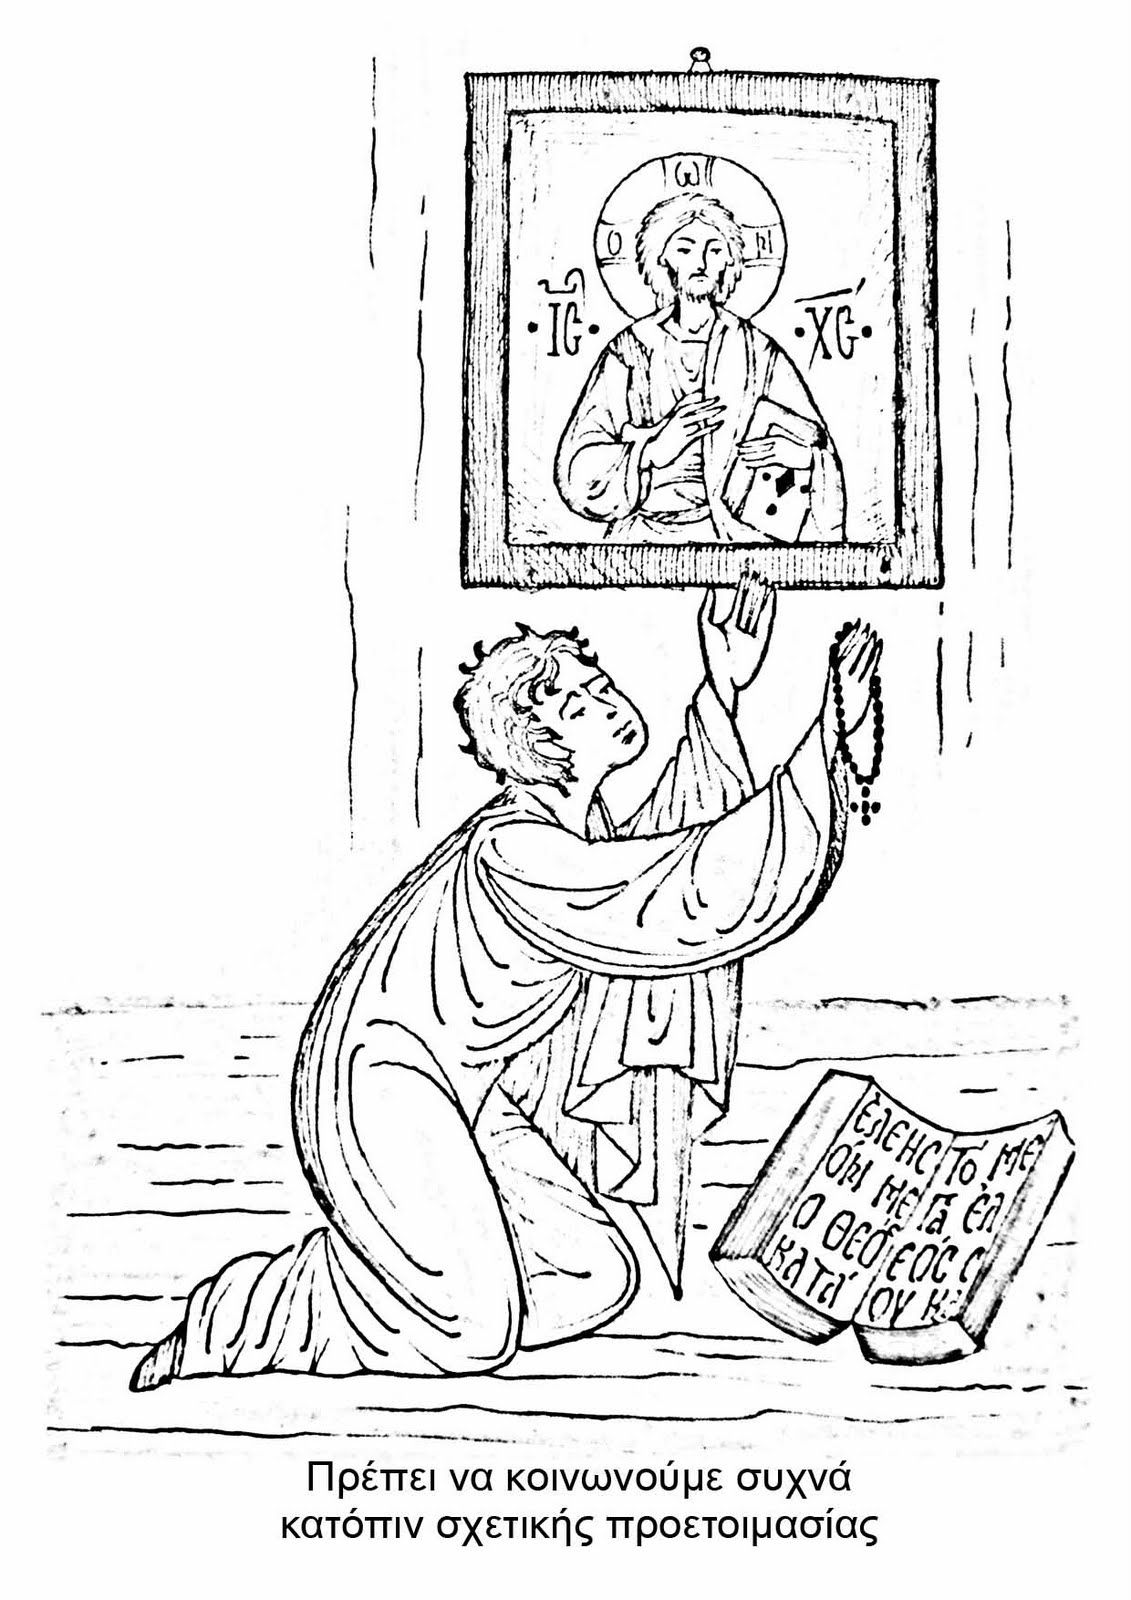 Orthodox Christian Education Orthodox Coloring Pages Christian Coloring Coloring Pages Coloring Books